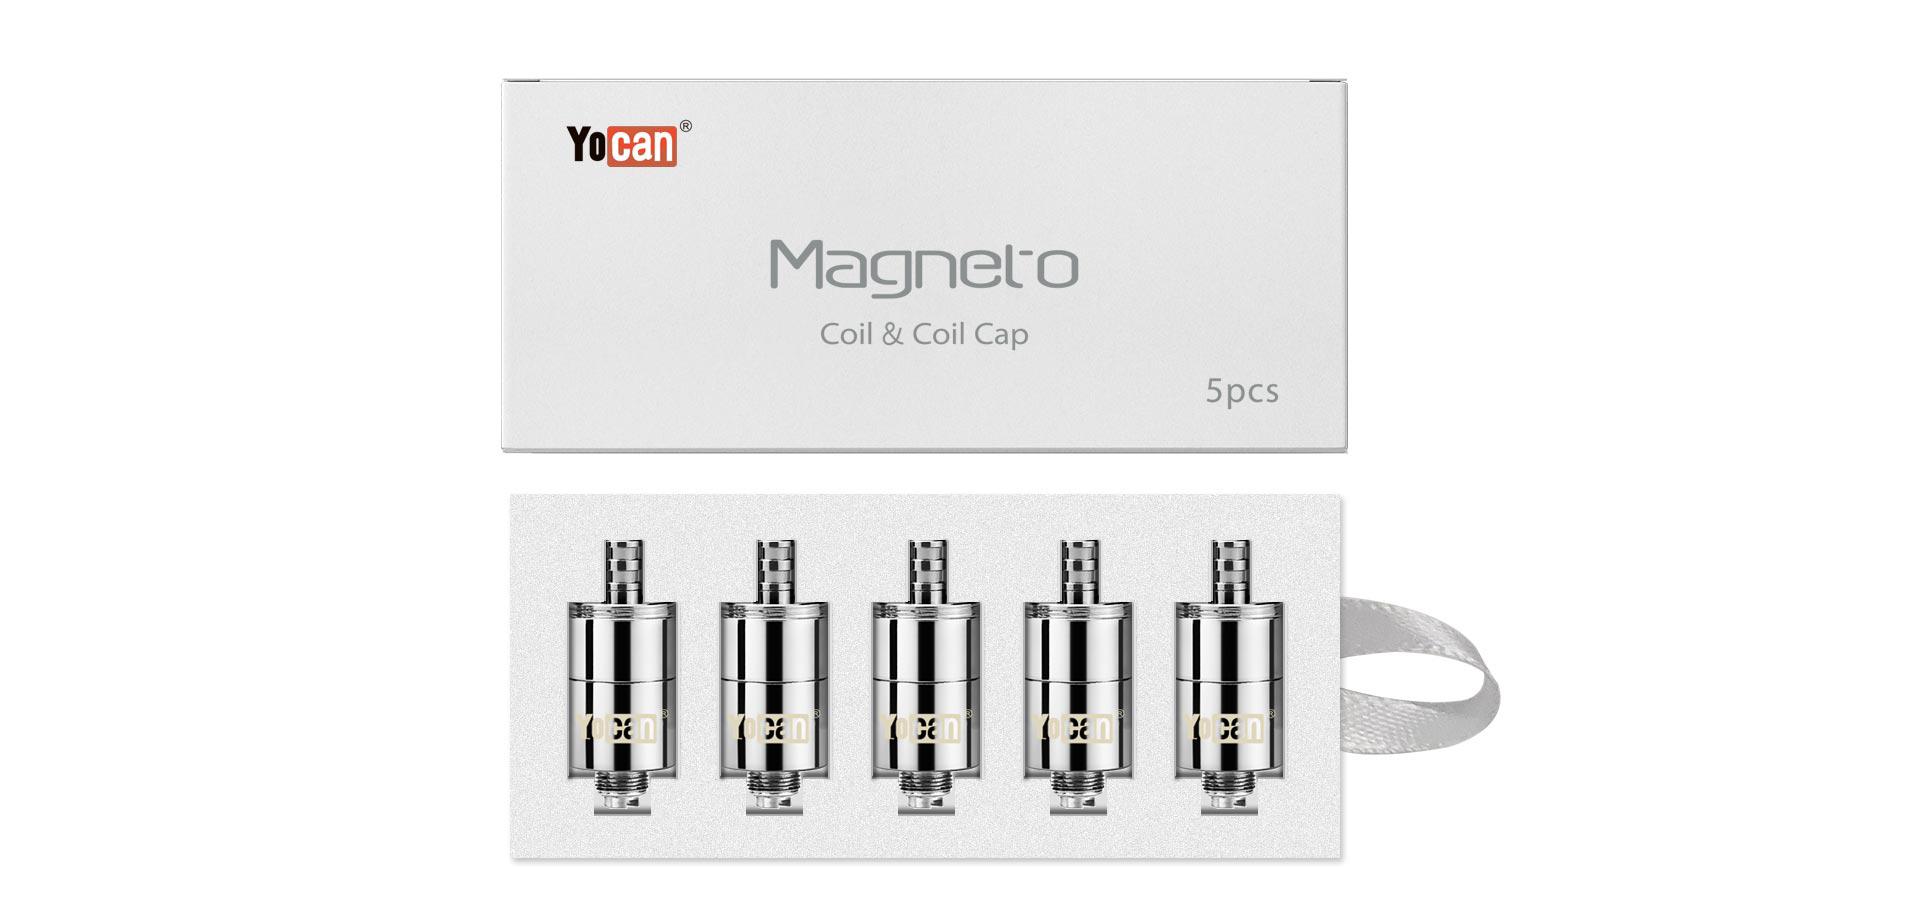 Yocan Magneto coil & coil cap - 5 pcs - 2020 version package box - 2